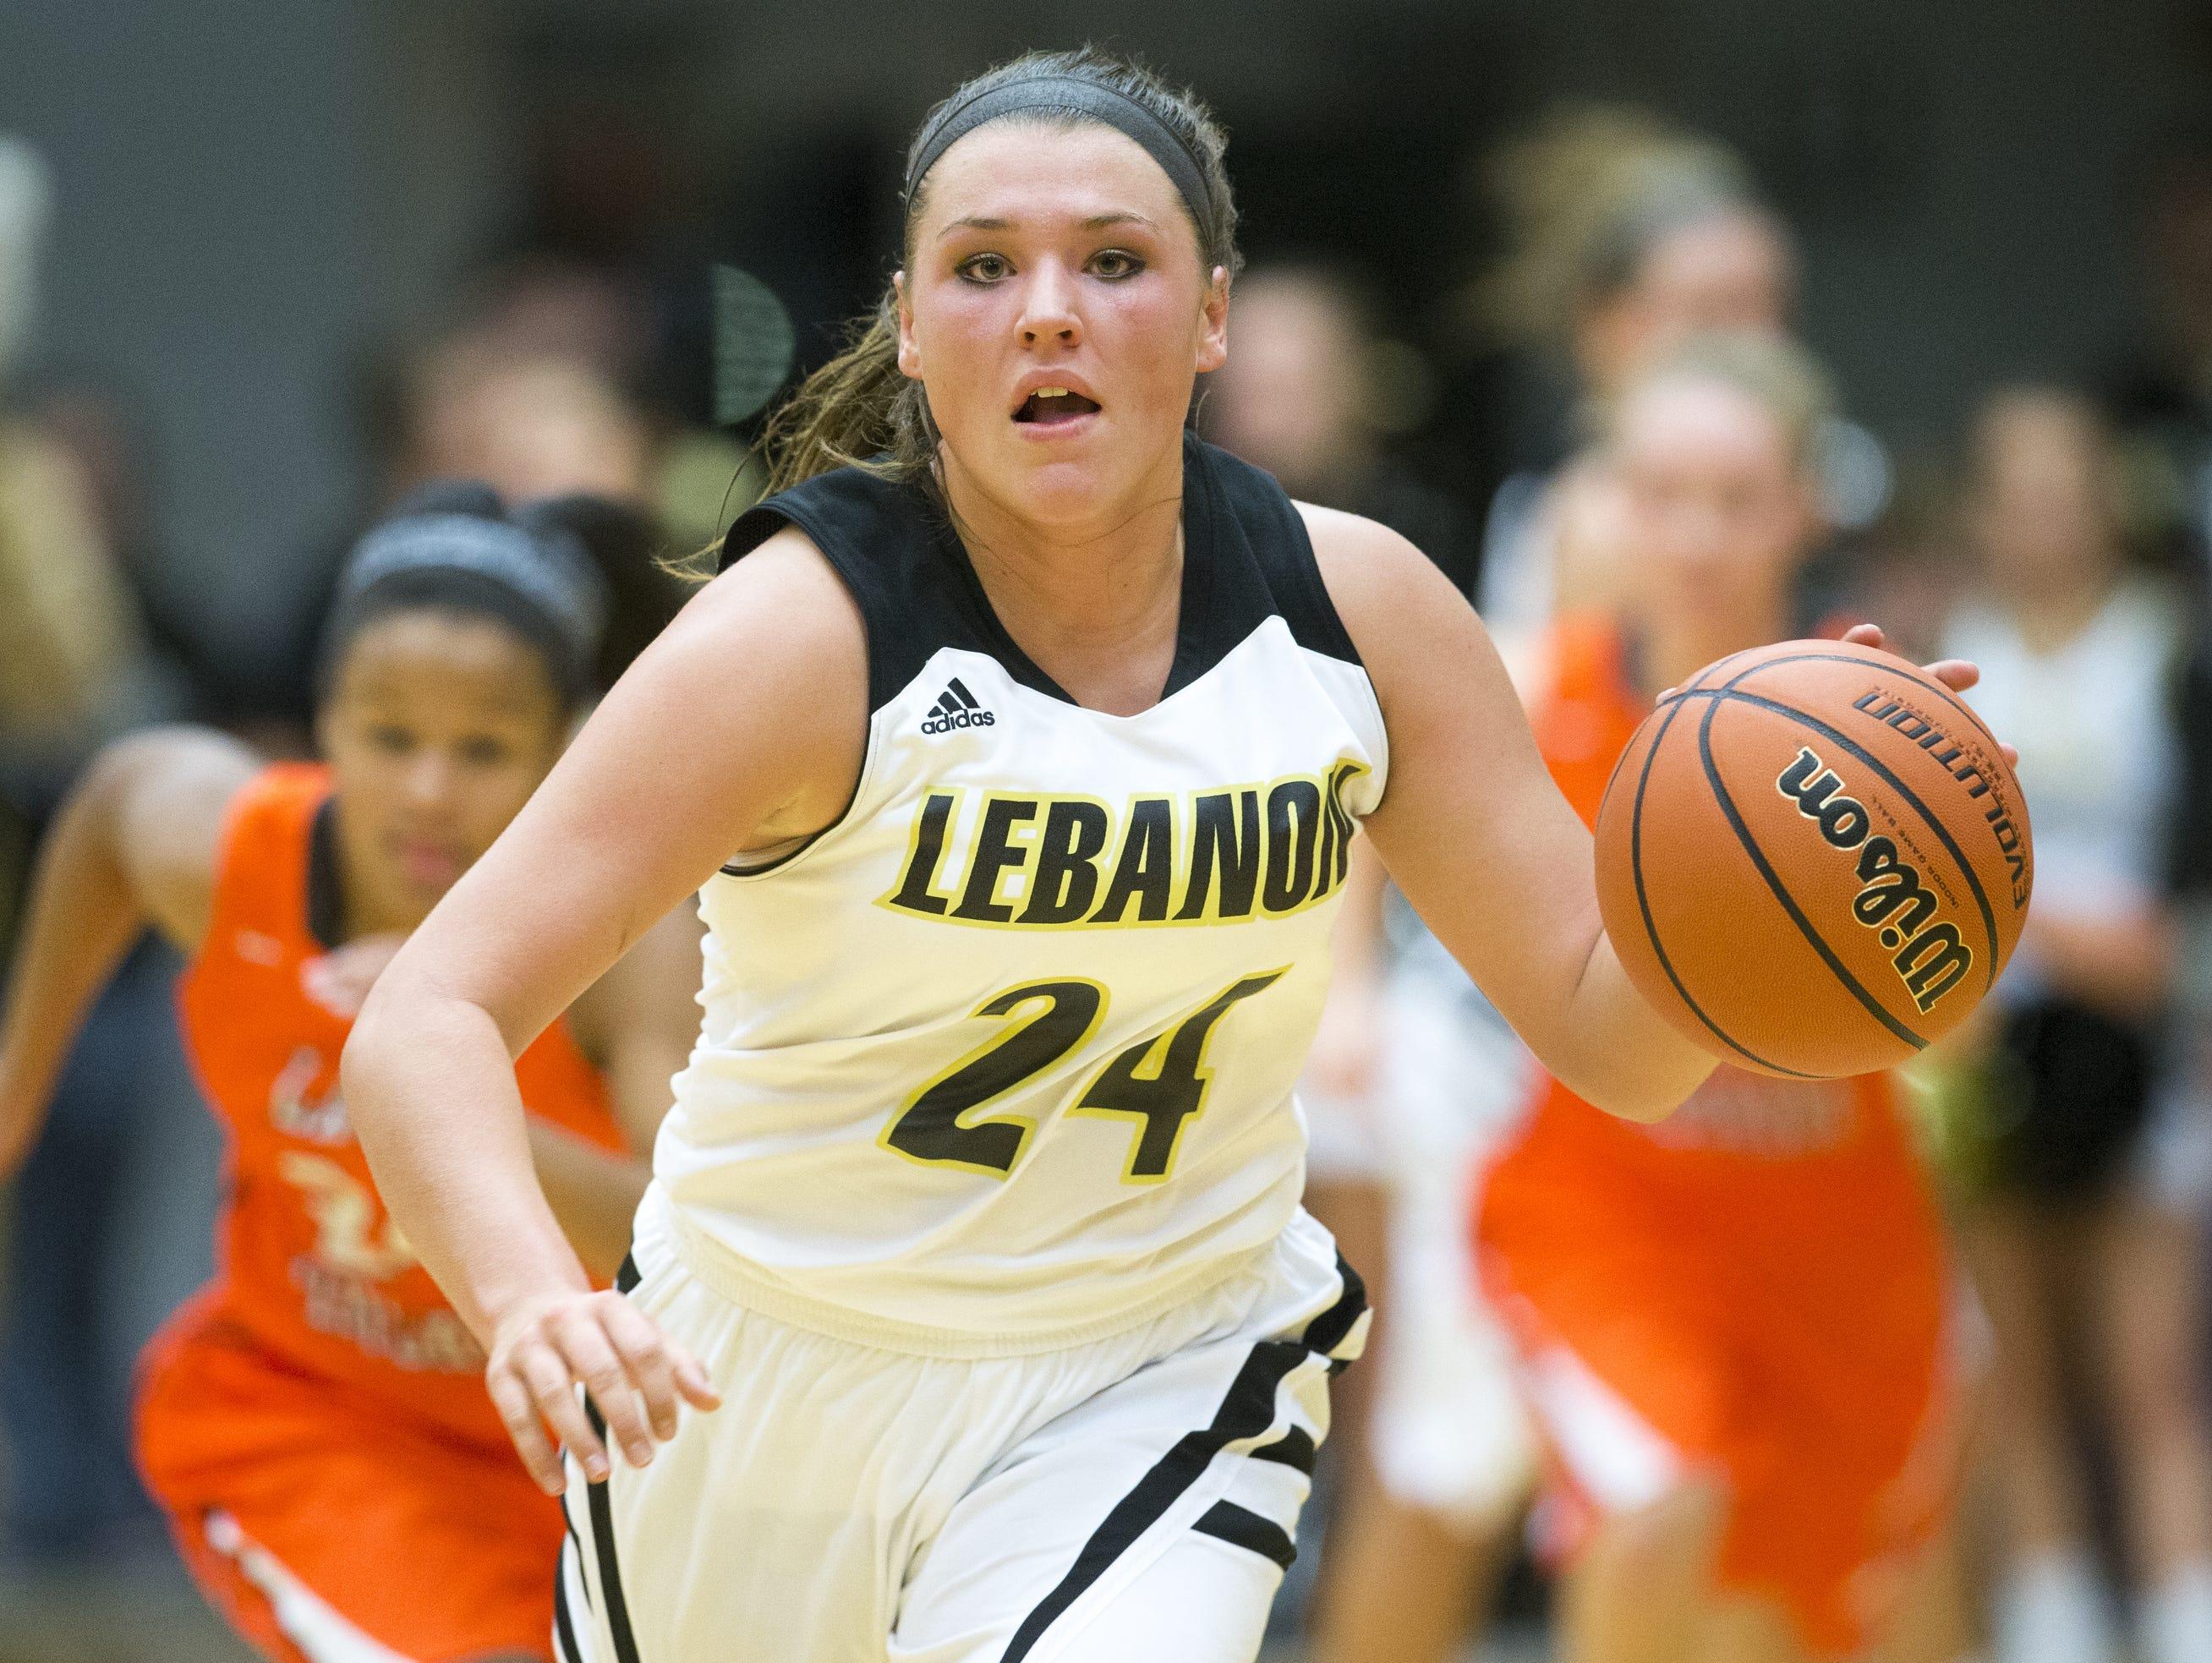 High-scoring Kristen Spolyar has set her sights on Rick Mount's Lebanon school record.